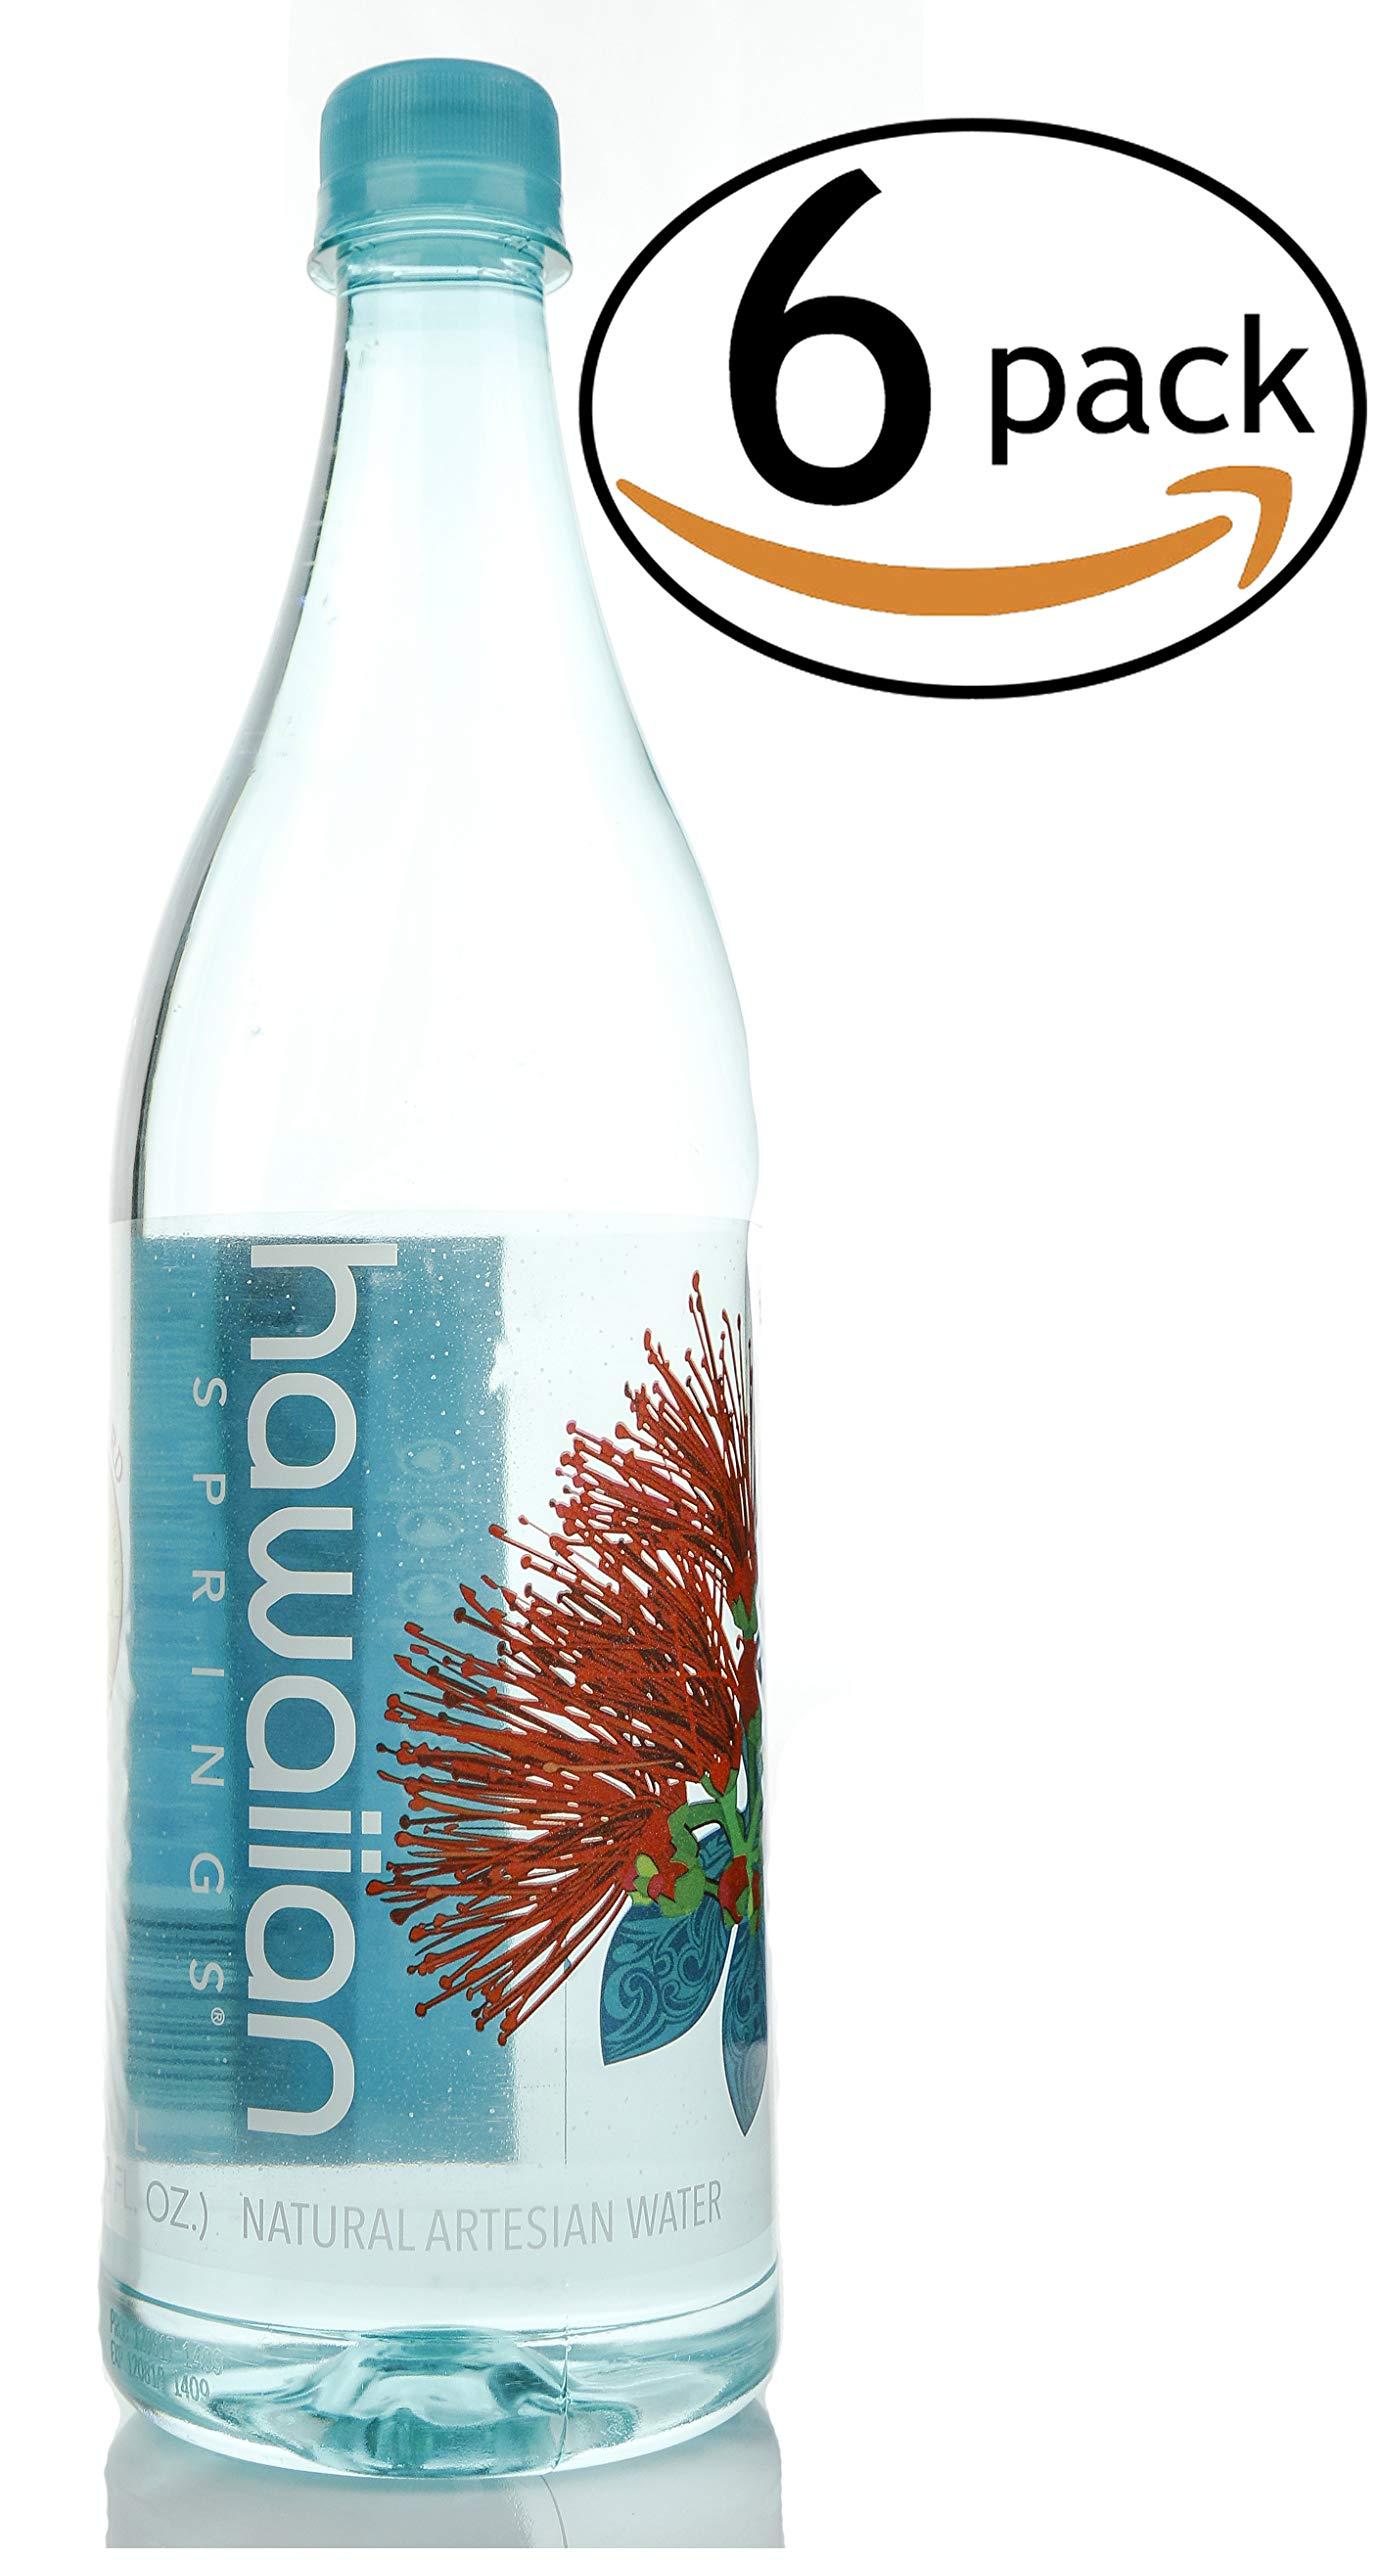 Hawaiian Springs Natural Artesian Water Bottled at the Source in Hawaii (1.0 L, 6 Pack) by Hawaiian Springs